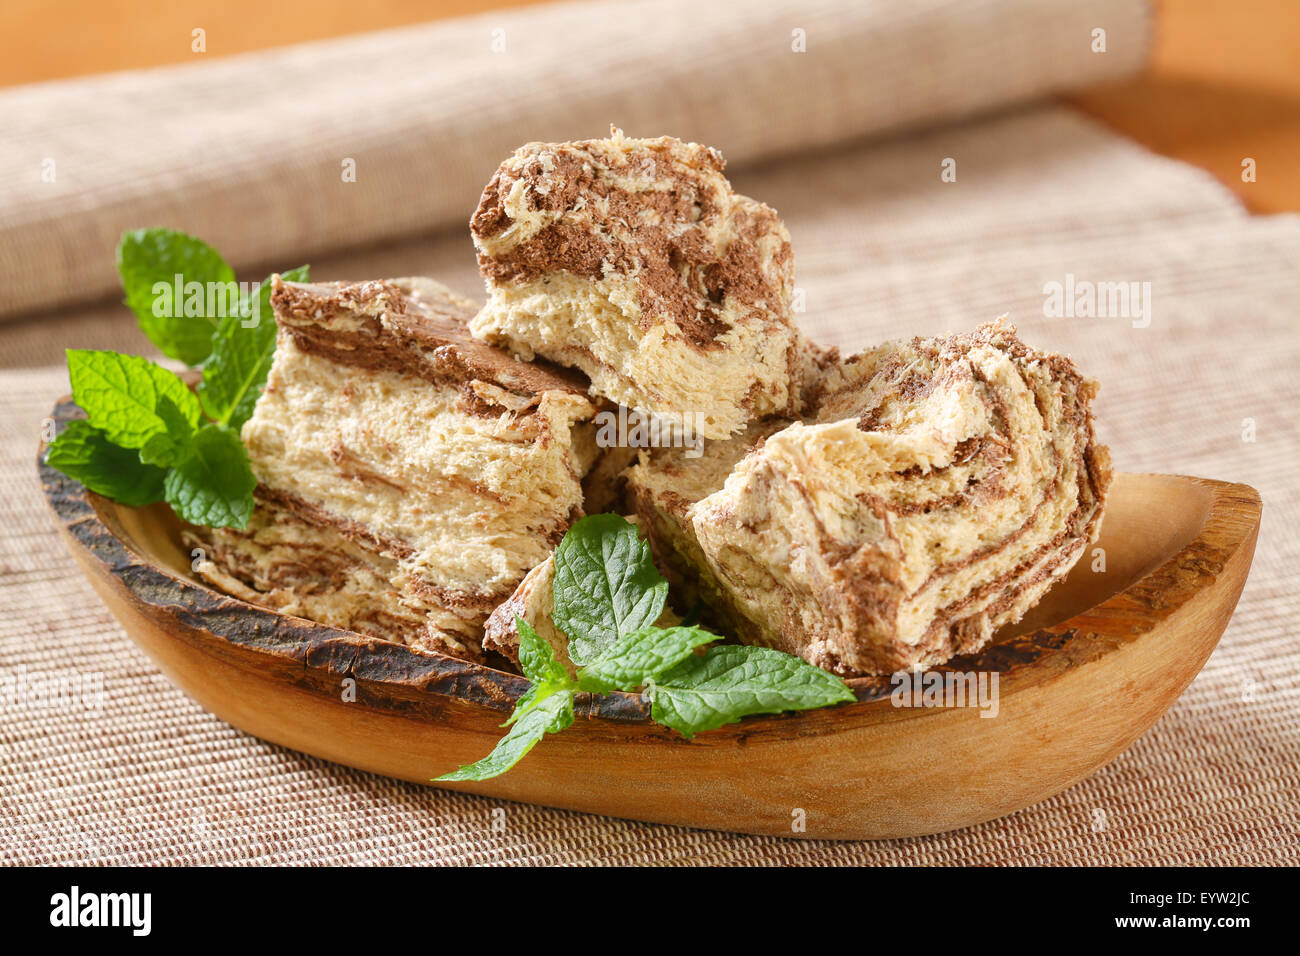 Marble sesame halva with cocoa - Stock Image